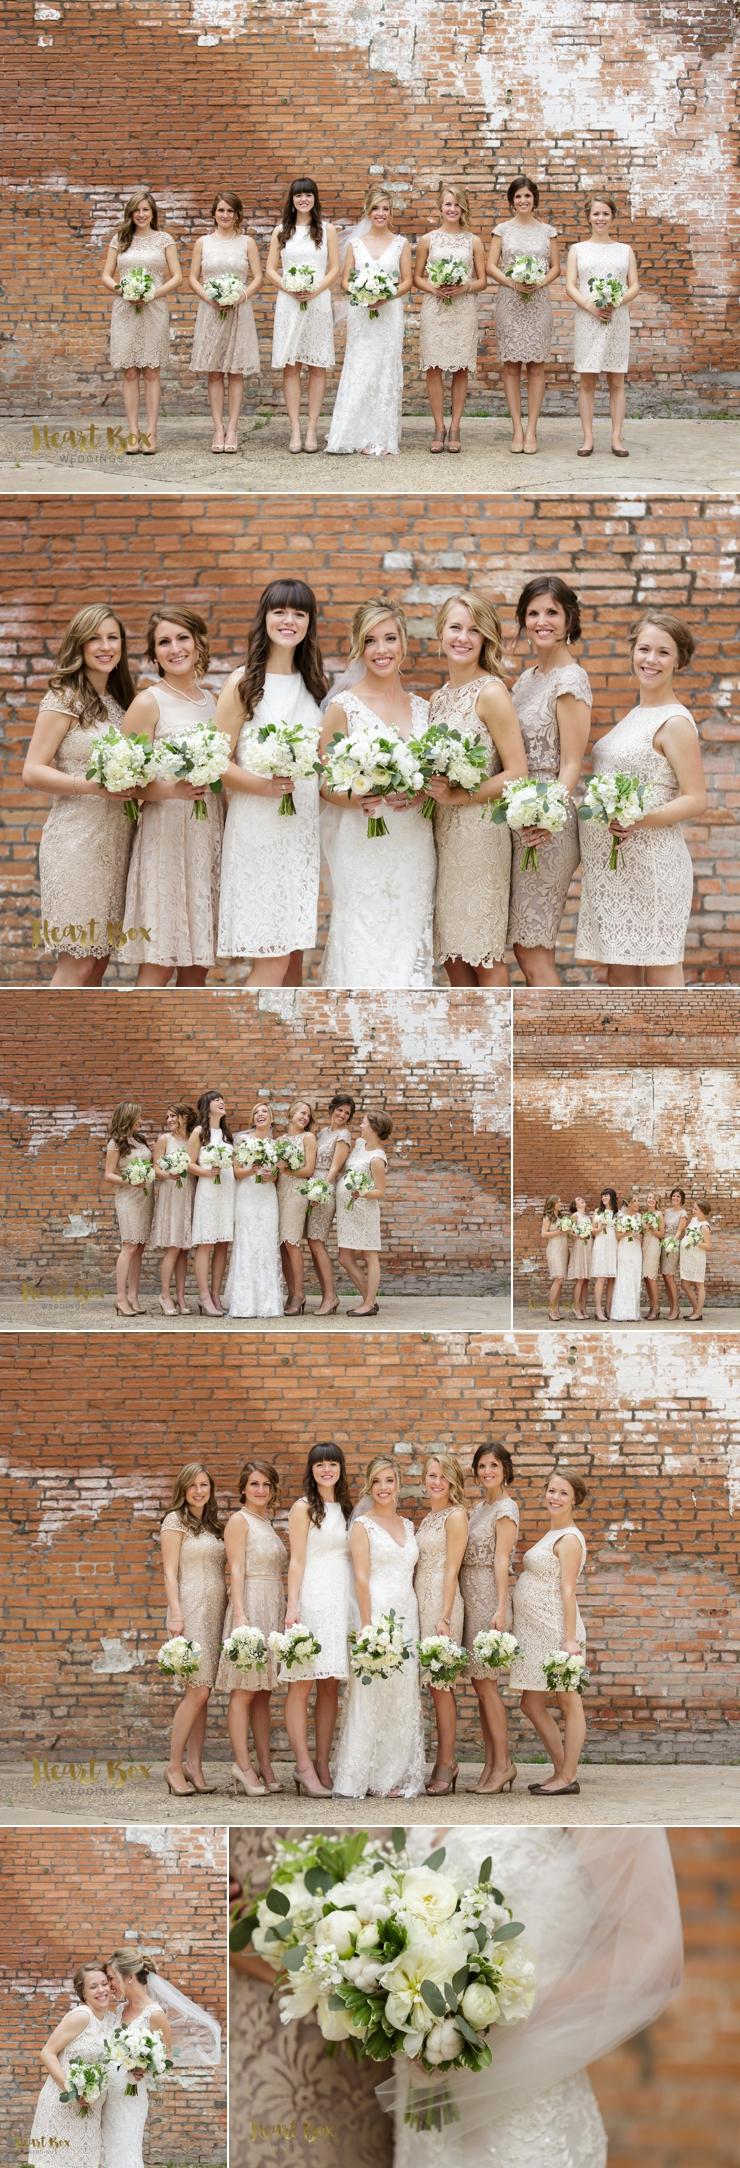 Popplewell Wedding Blog Collages 6.jpg